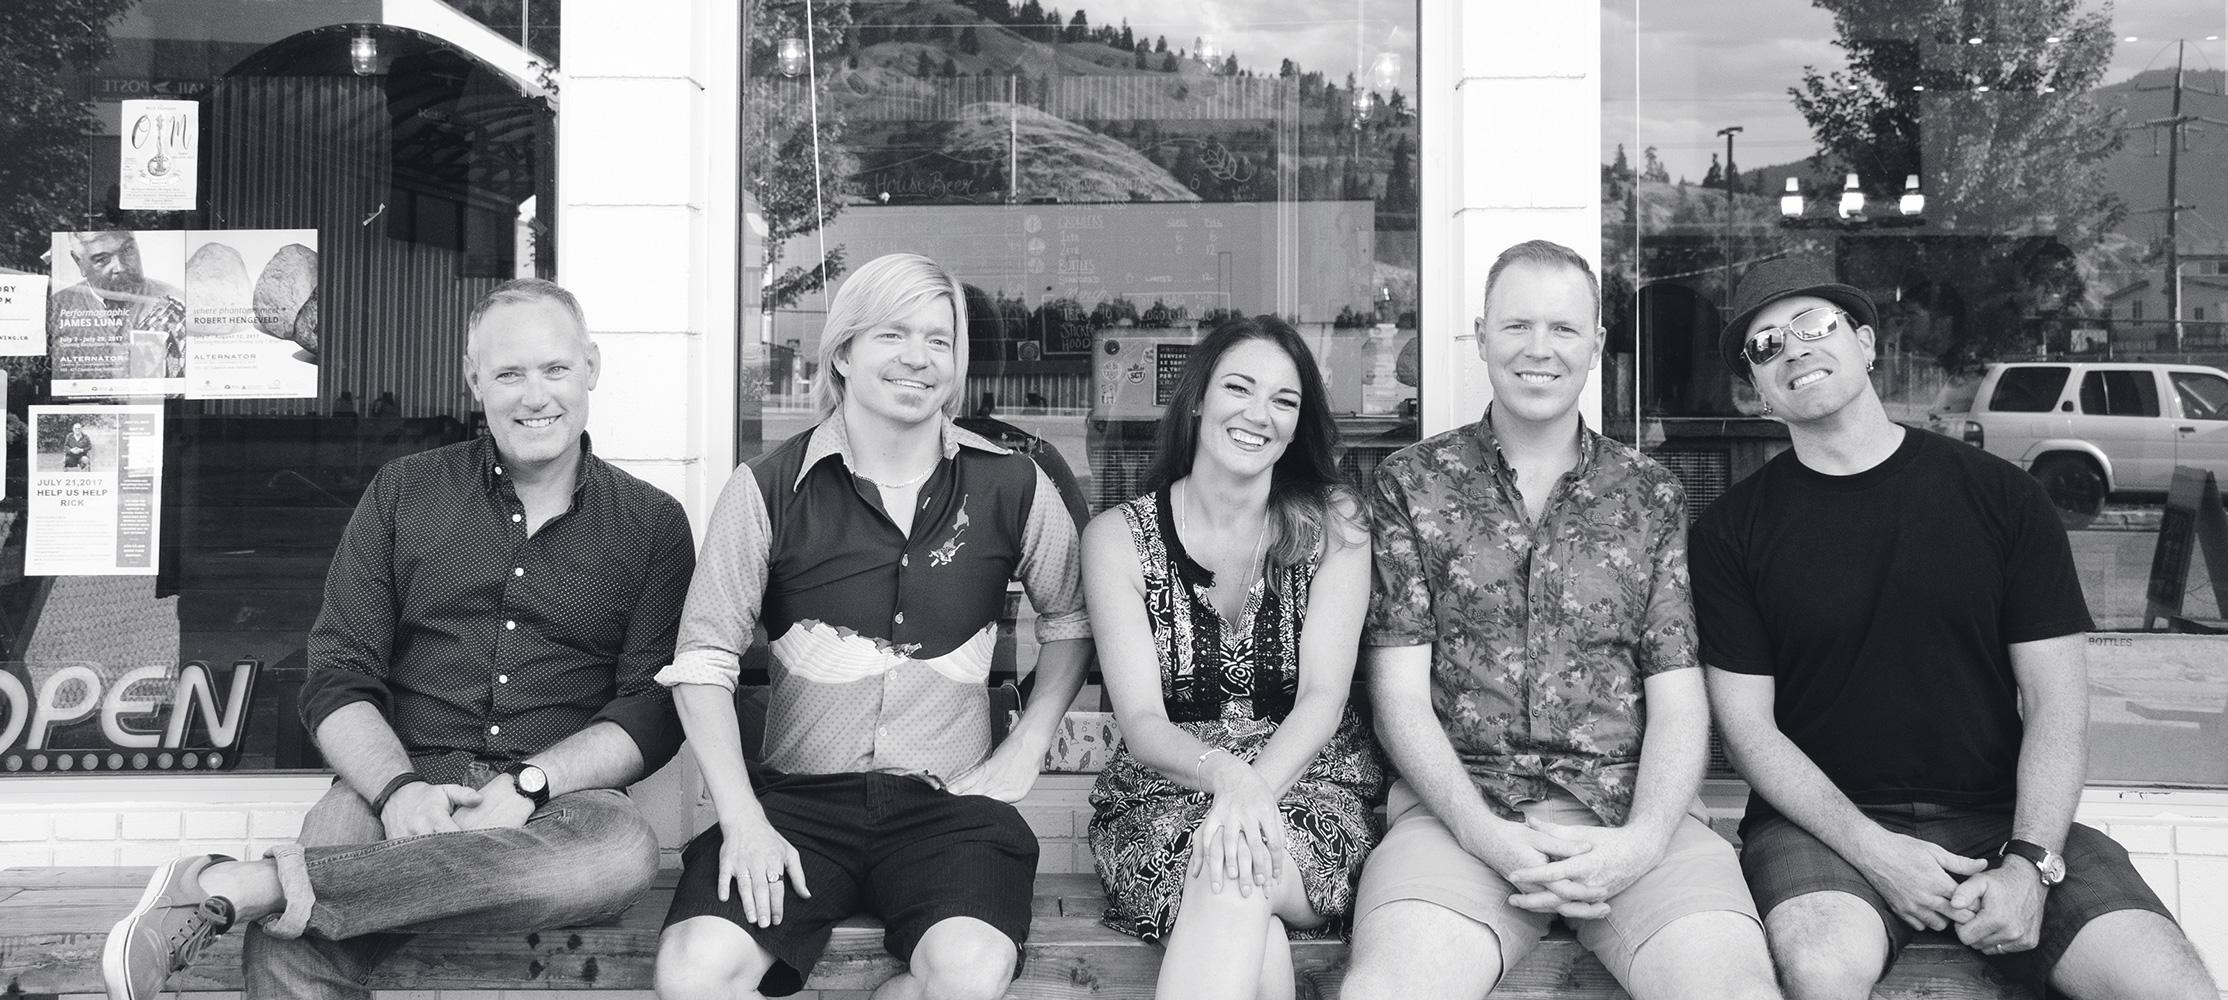 Insiders group photo